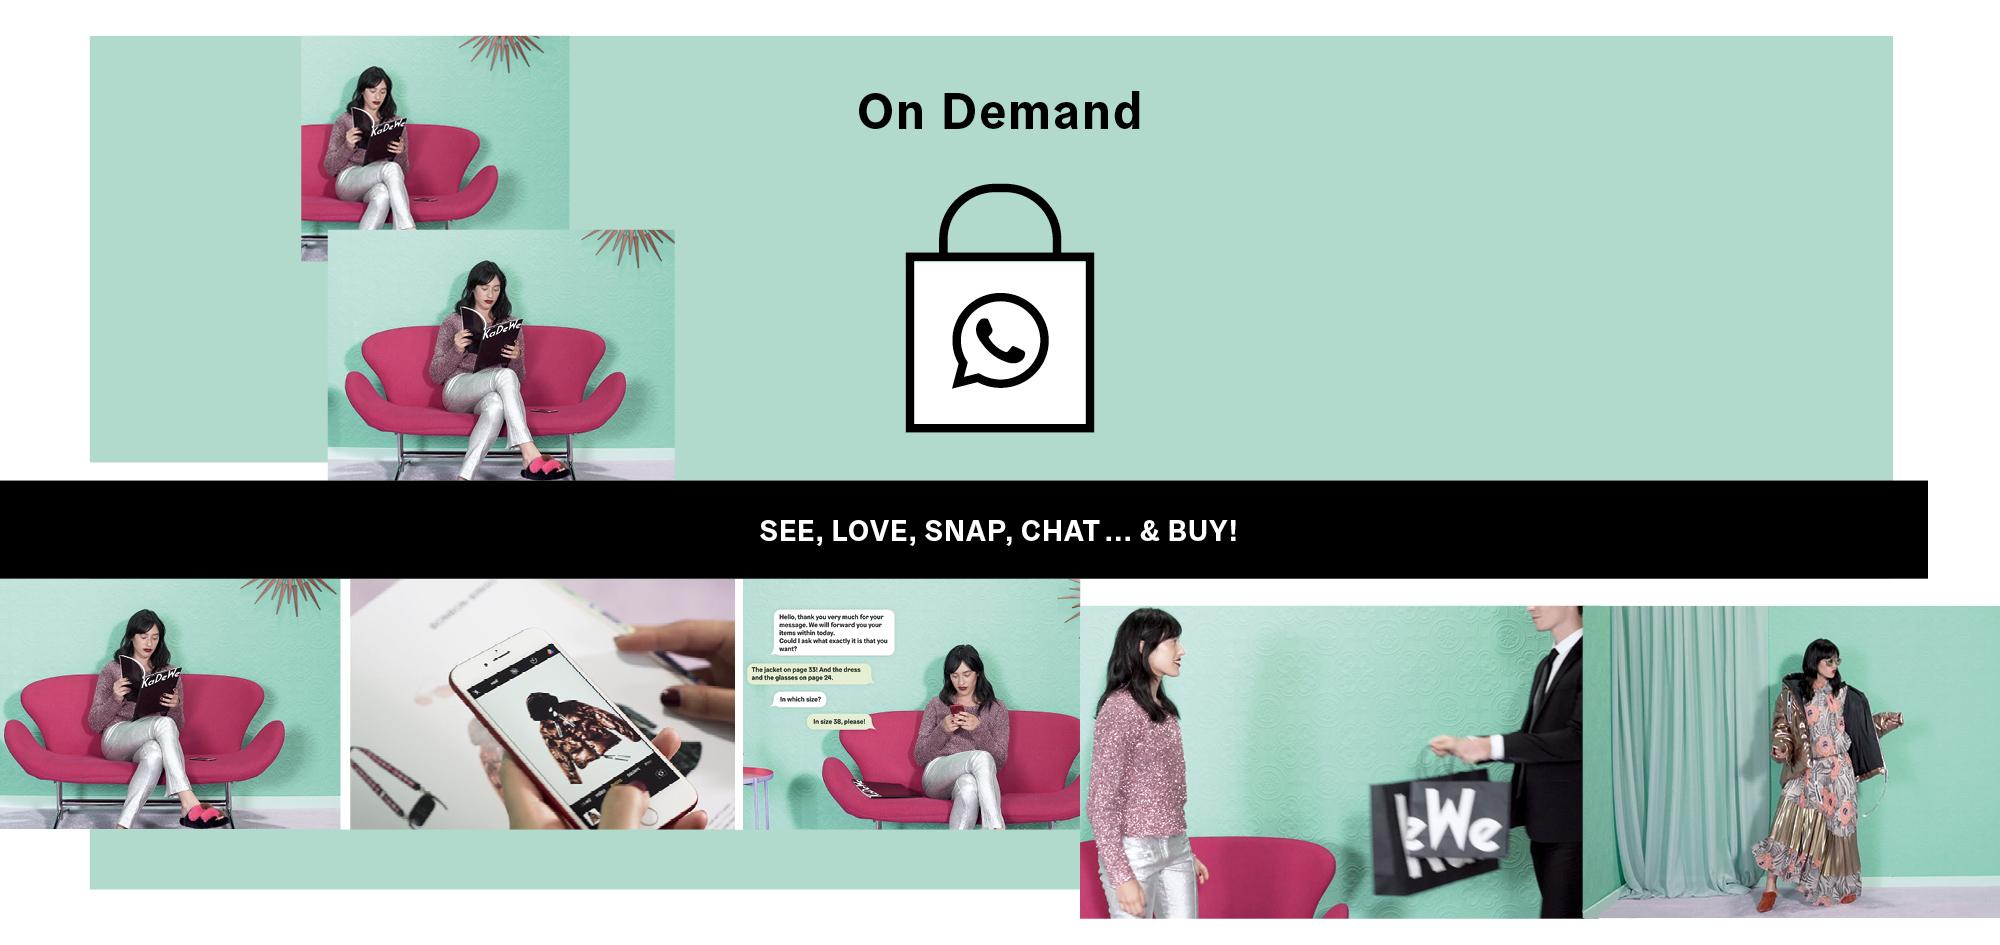 Online-Shopping-On-Demand-Whatsapp-Shop